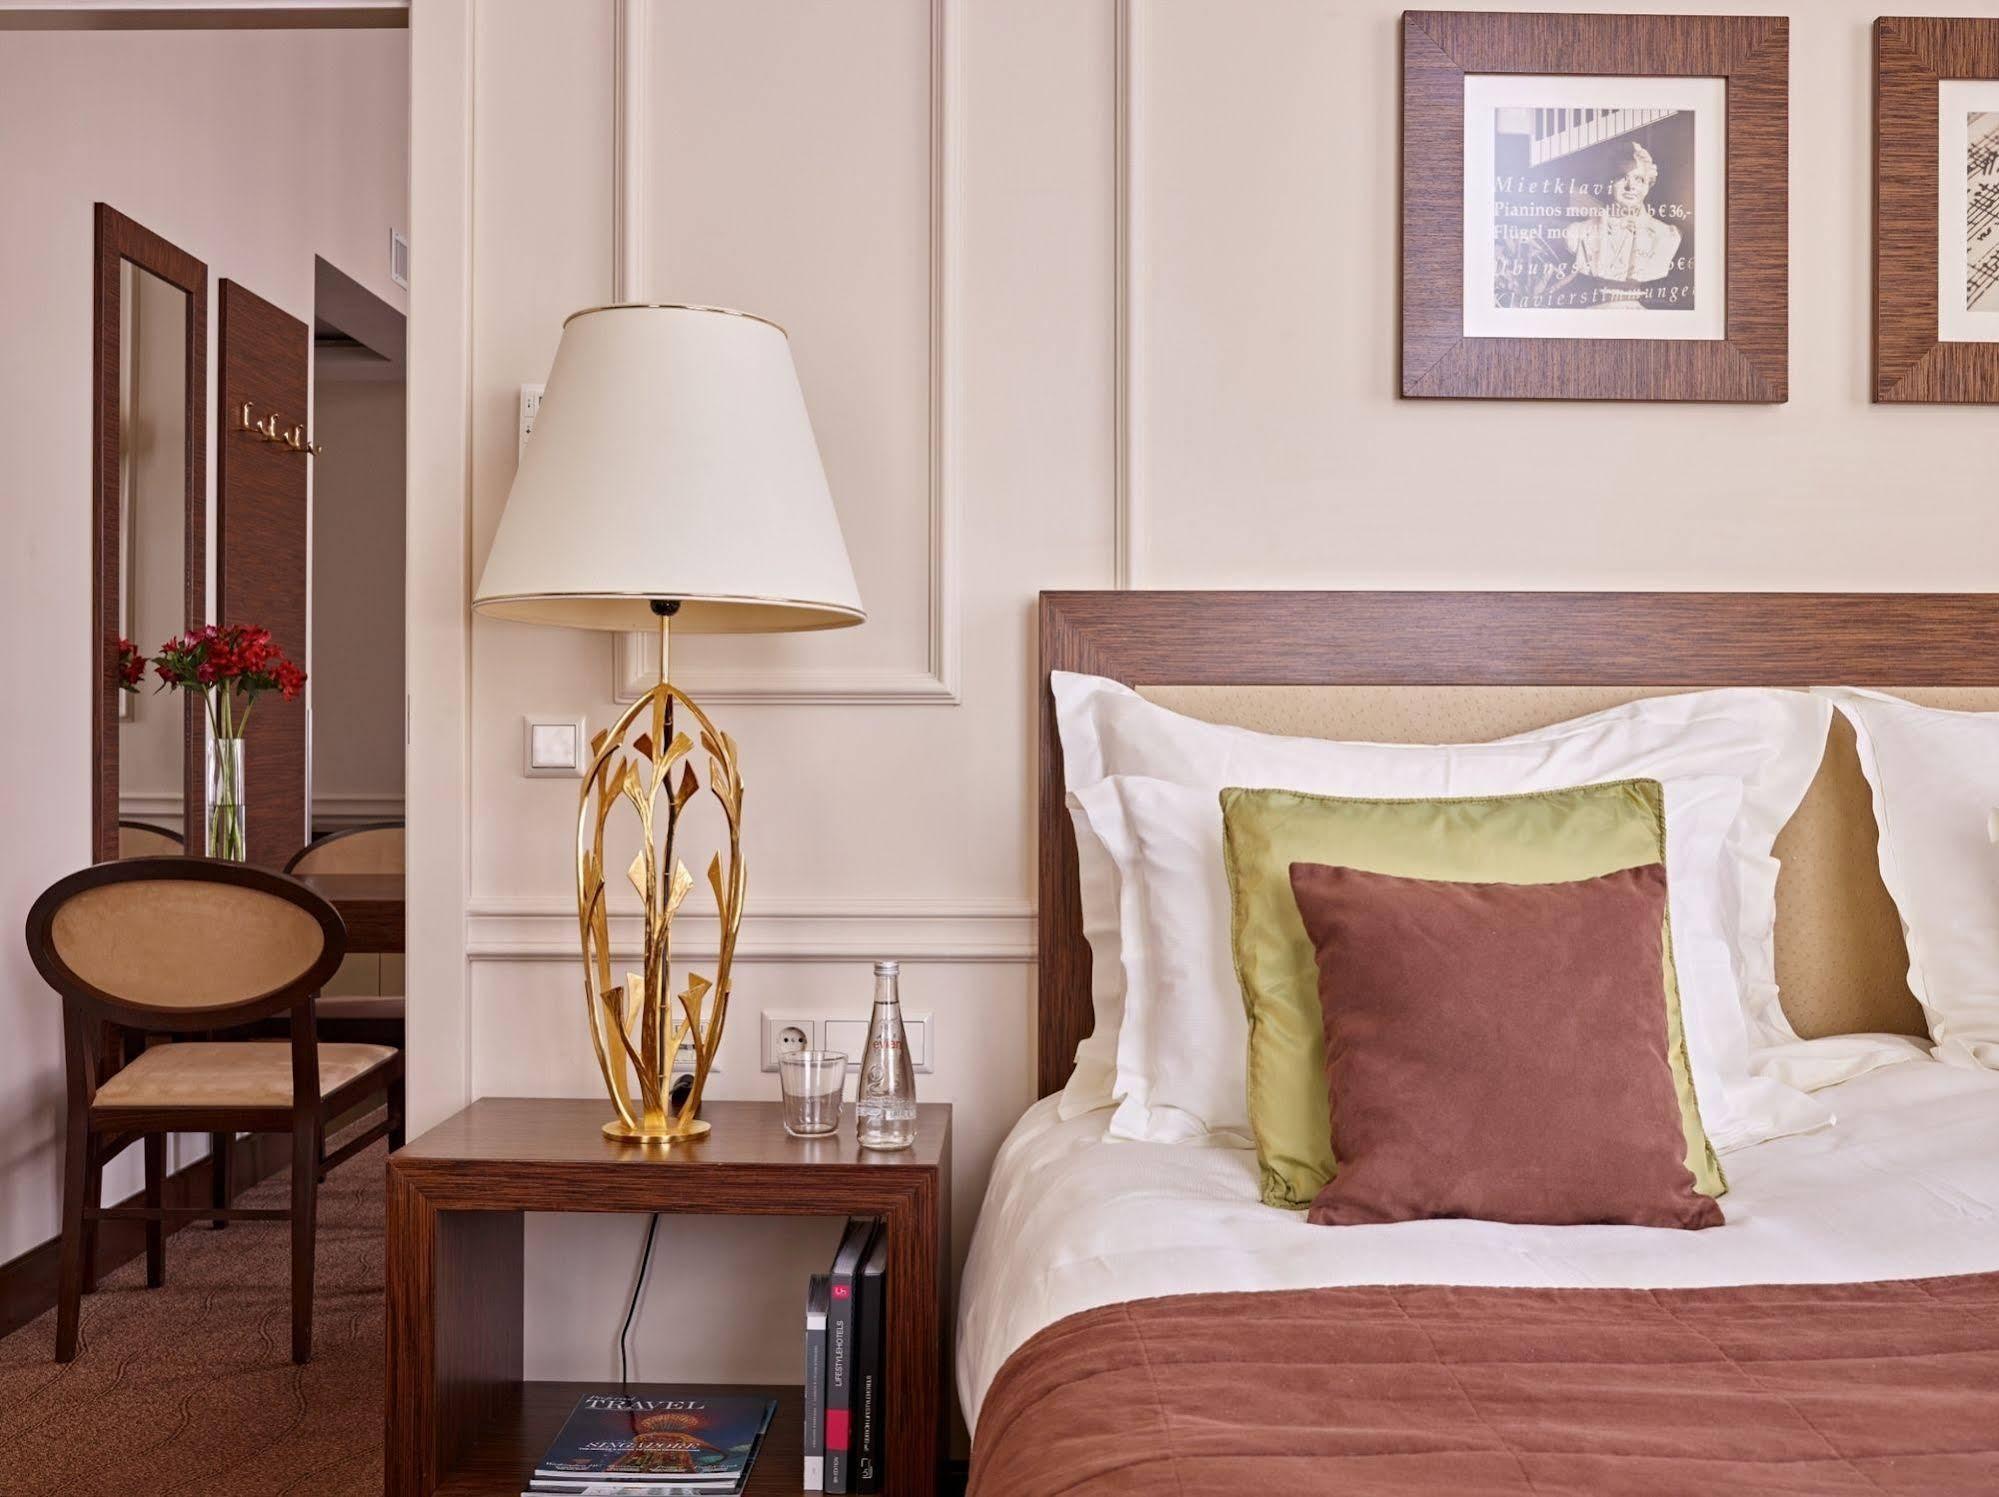 The Ring Vienna's Casual Luxury Hotel ( رینگ ویناس كاسوال لاکچری هتل)